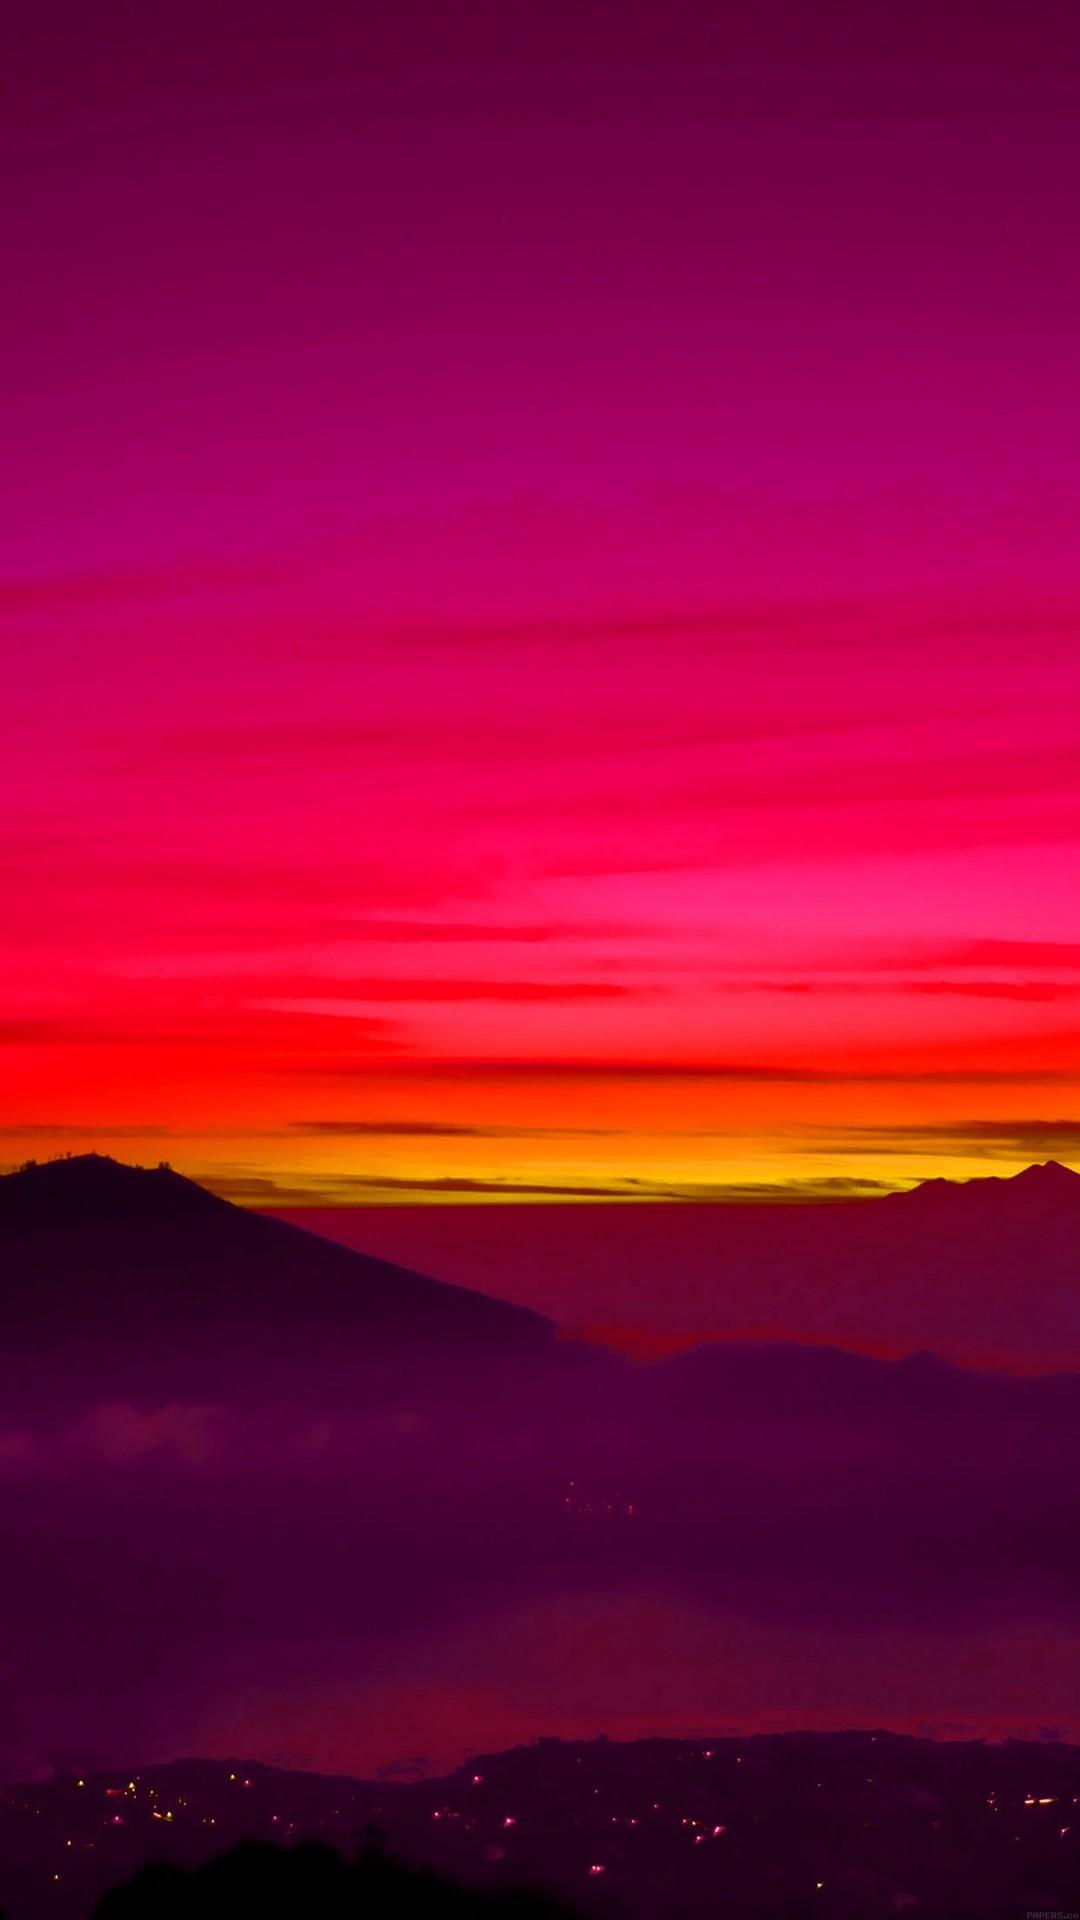 Red Balinese Dream Sea Mountain Sunset #iPhone #6 #wallpaper